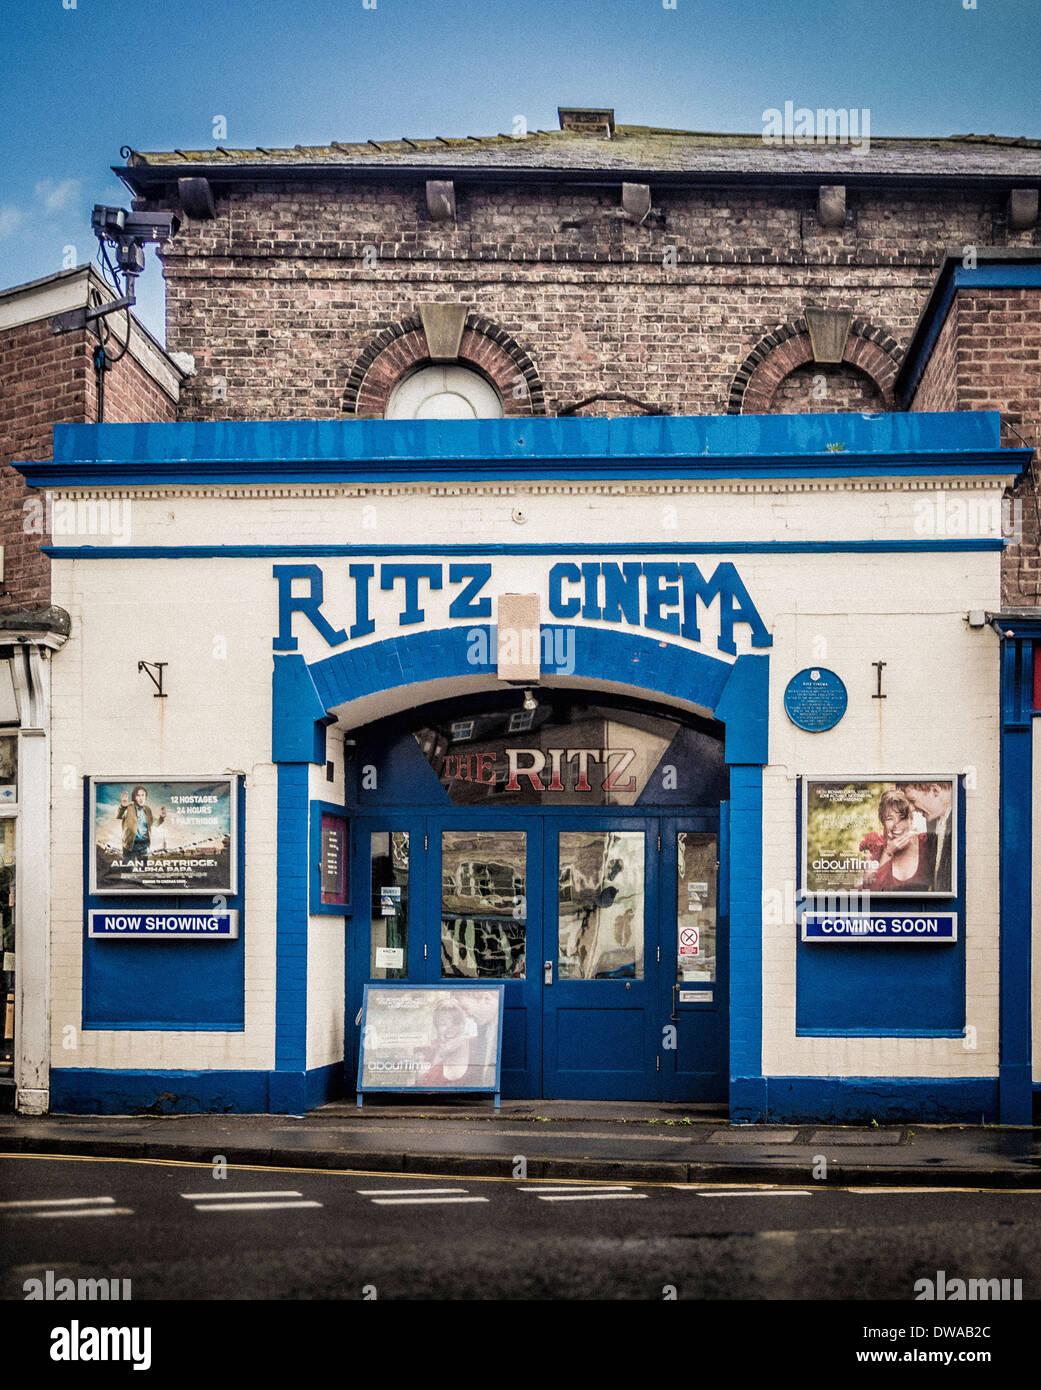 Ritz Cinema, Thirsk, North Yorkshire, UK. - Stock Image